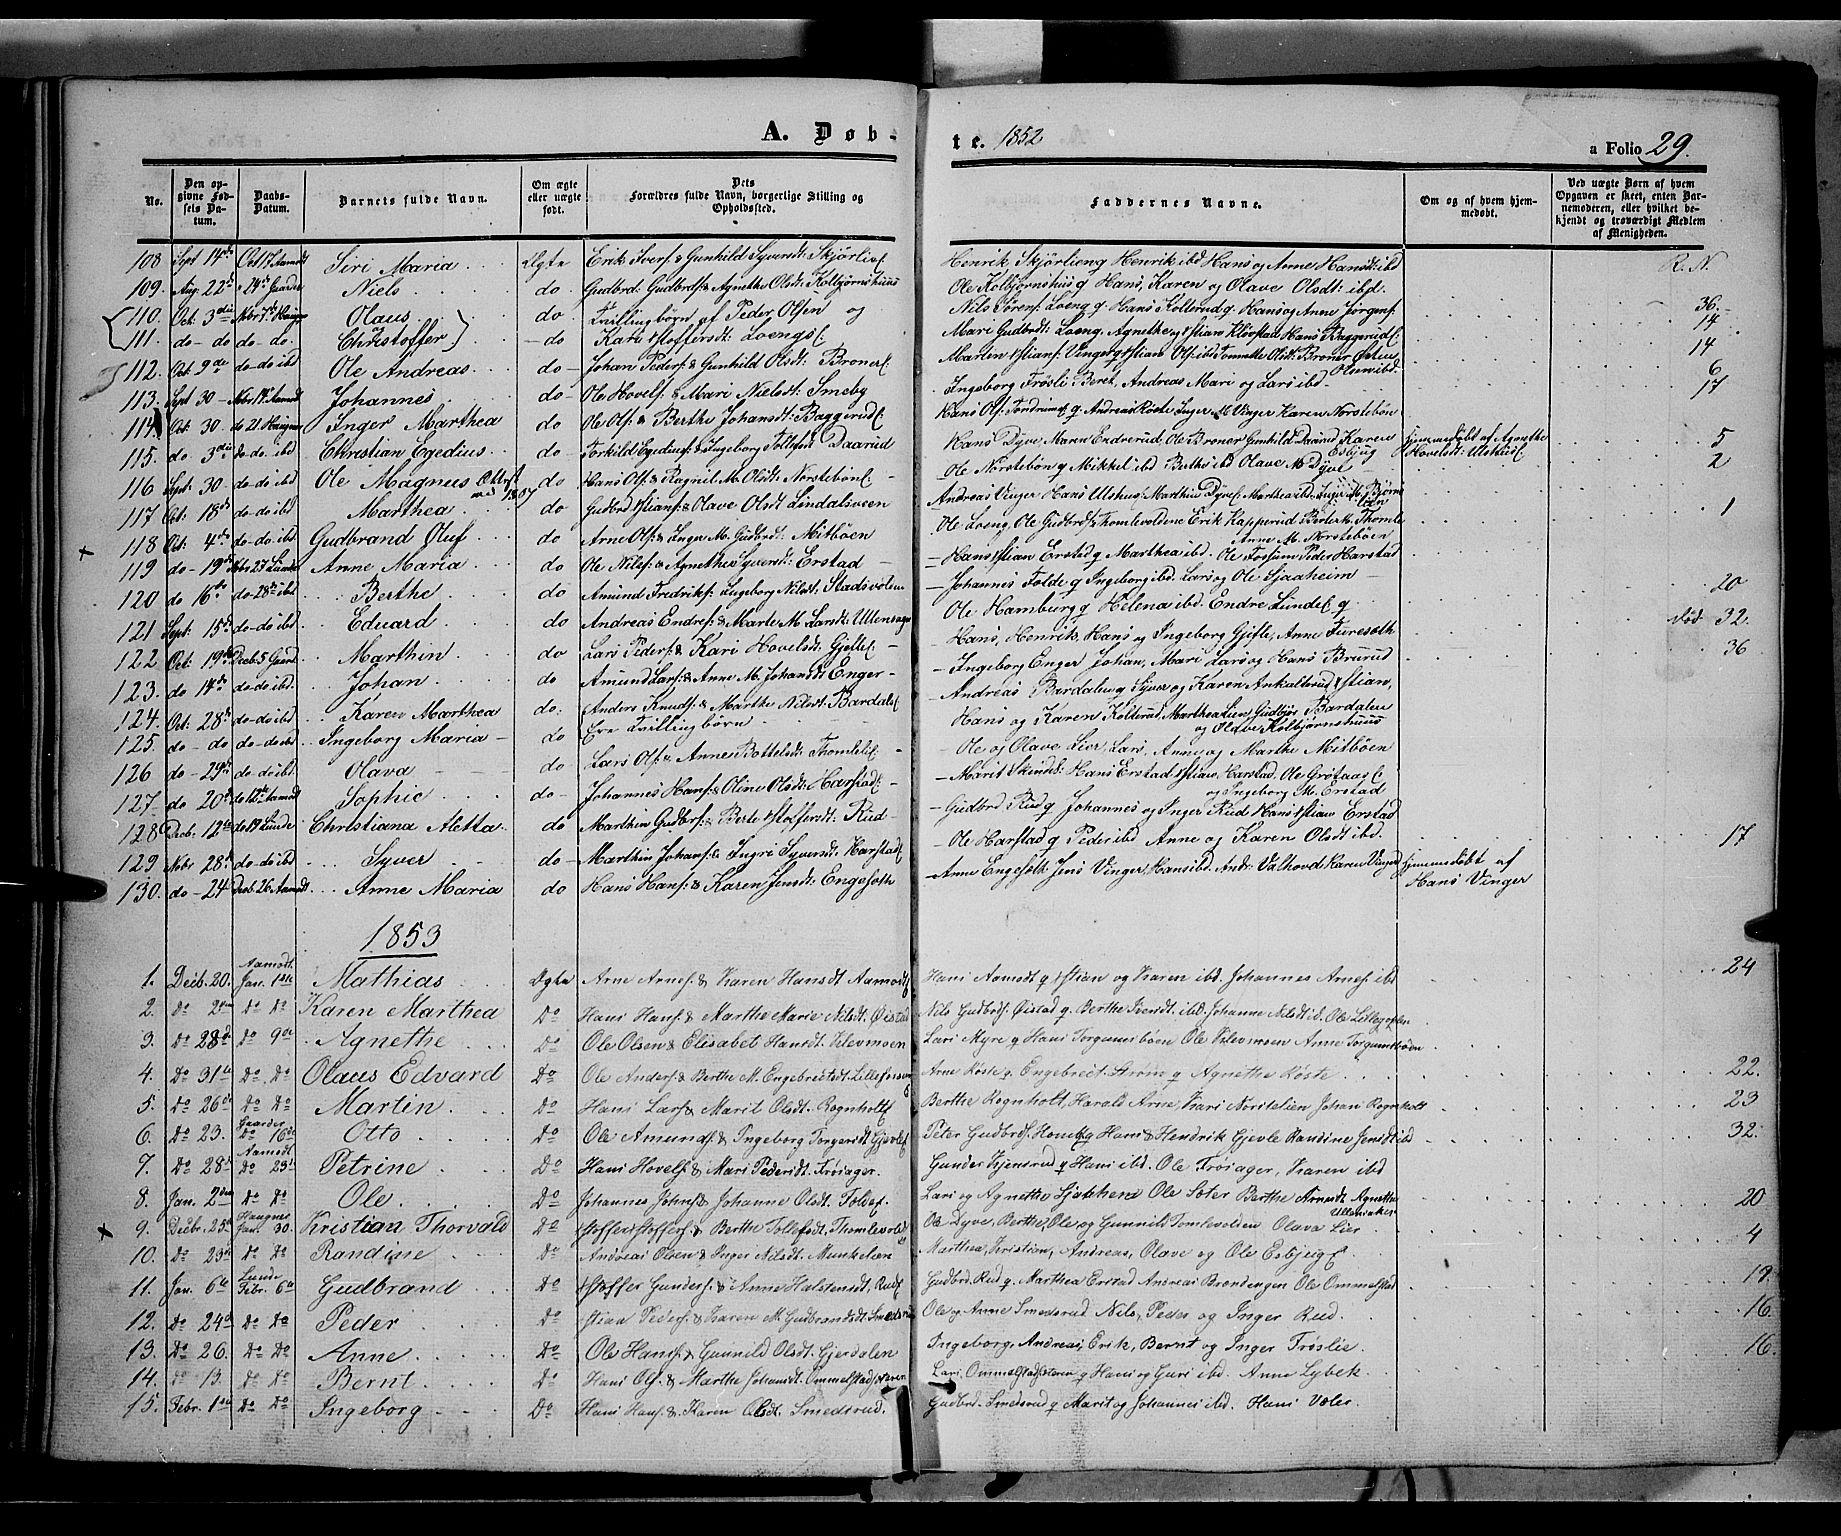 SAH, Land prestekontor, Ministerialbok nr. 10, 1847-1859, s. 29